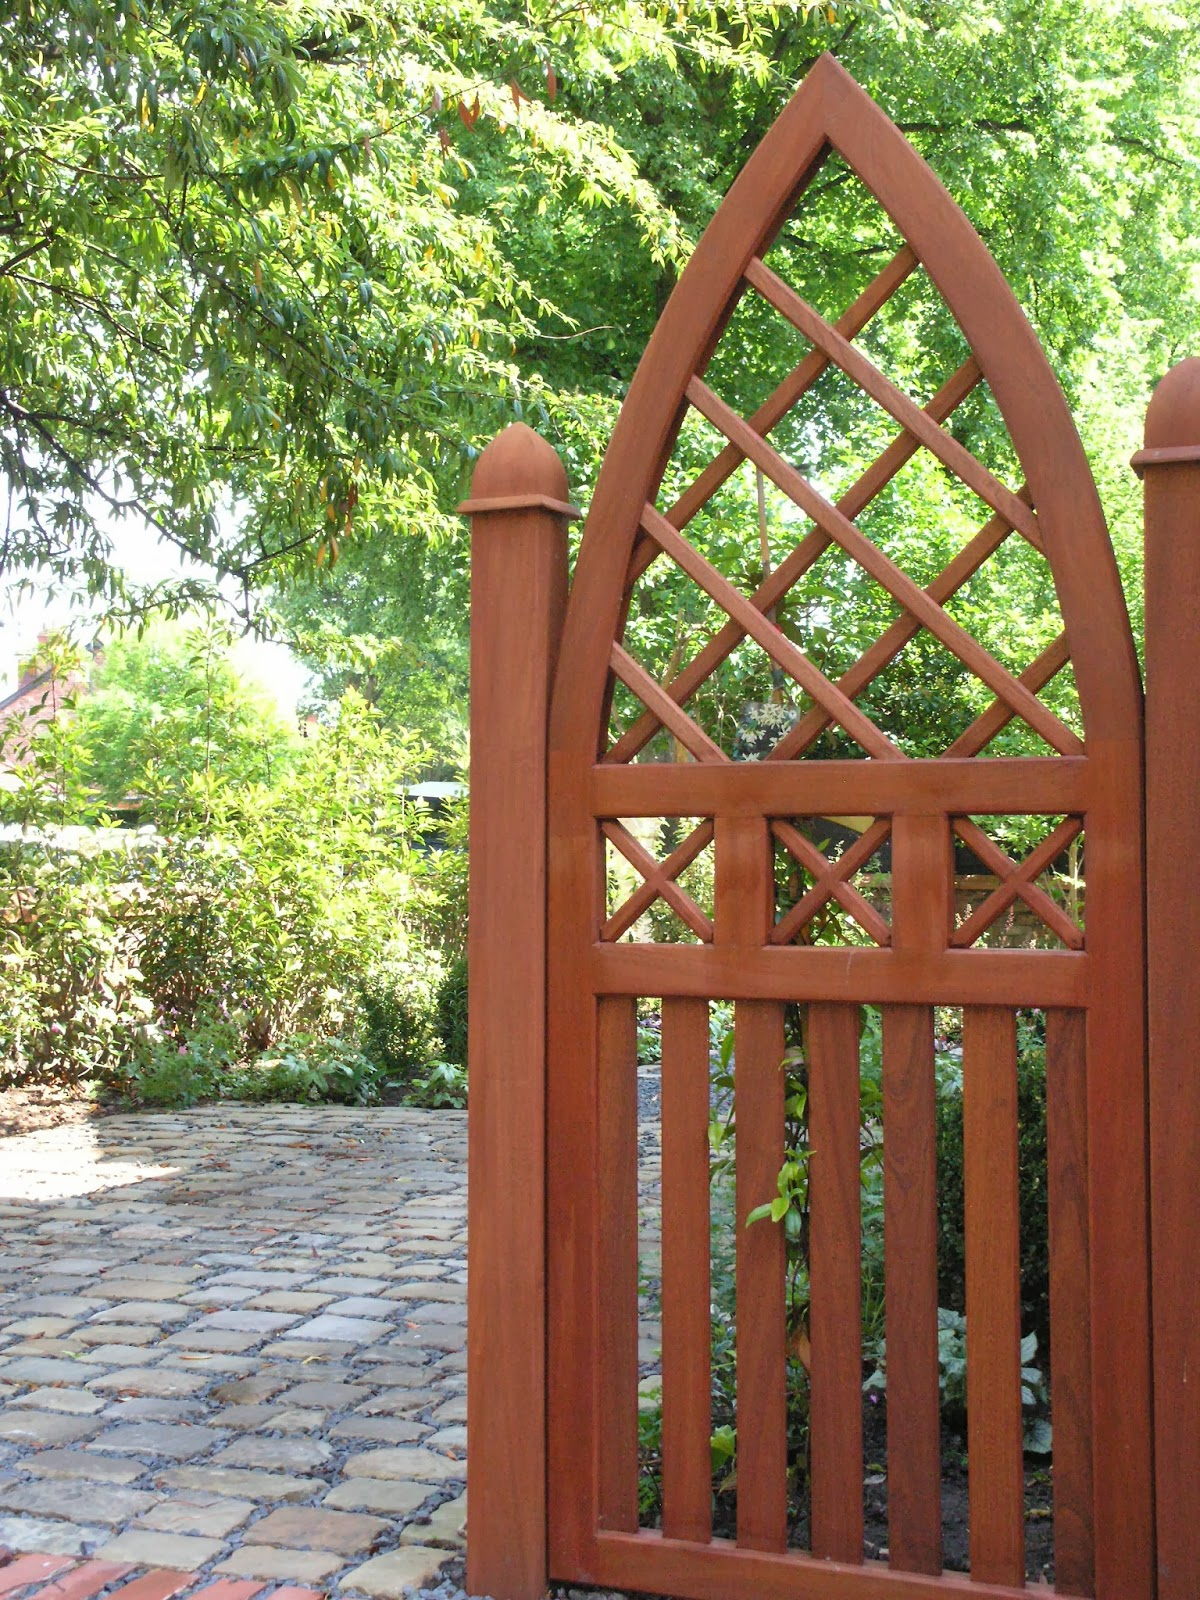 David Keegans Garden Design Blog: Front garden design ...